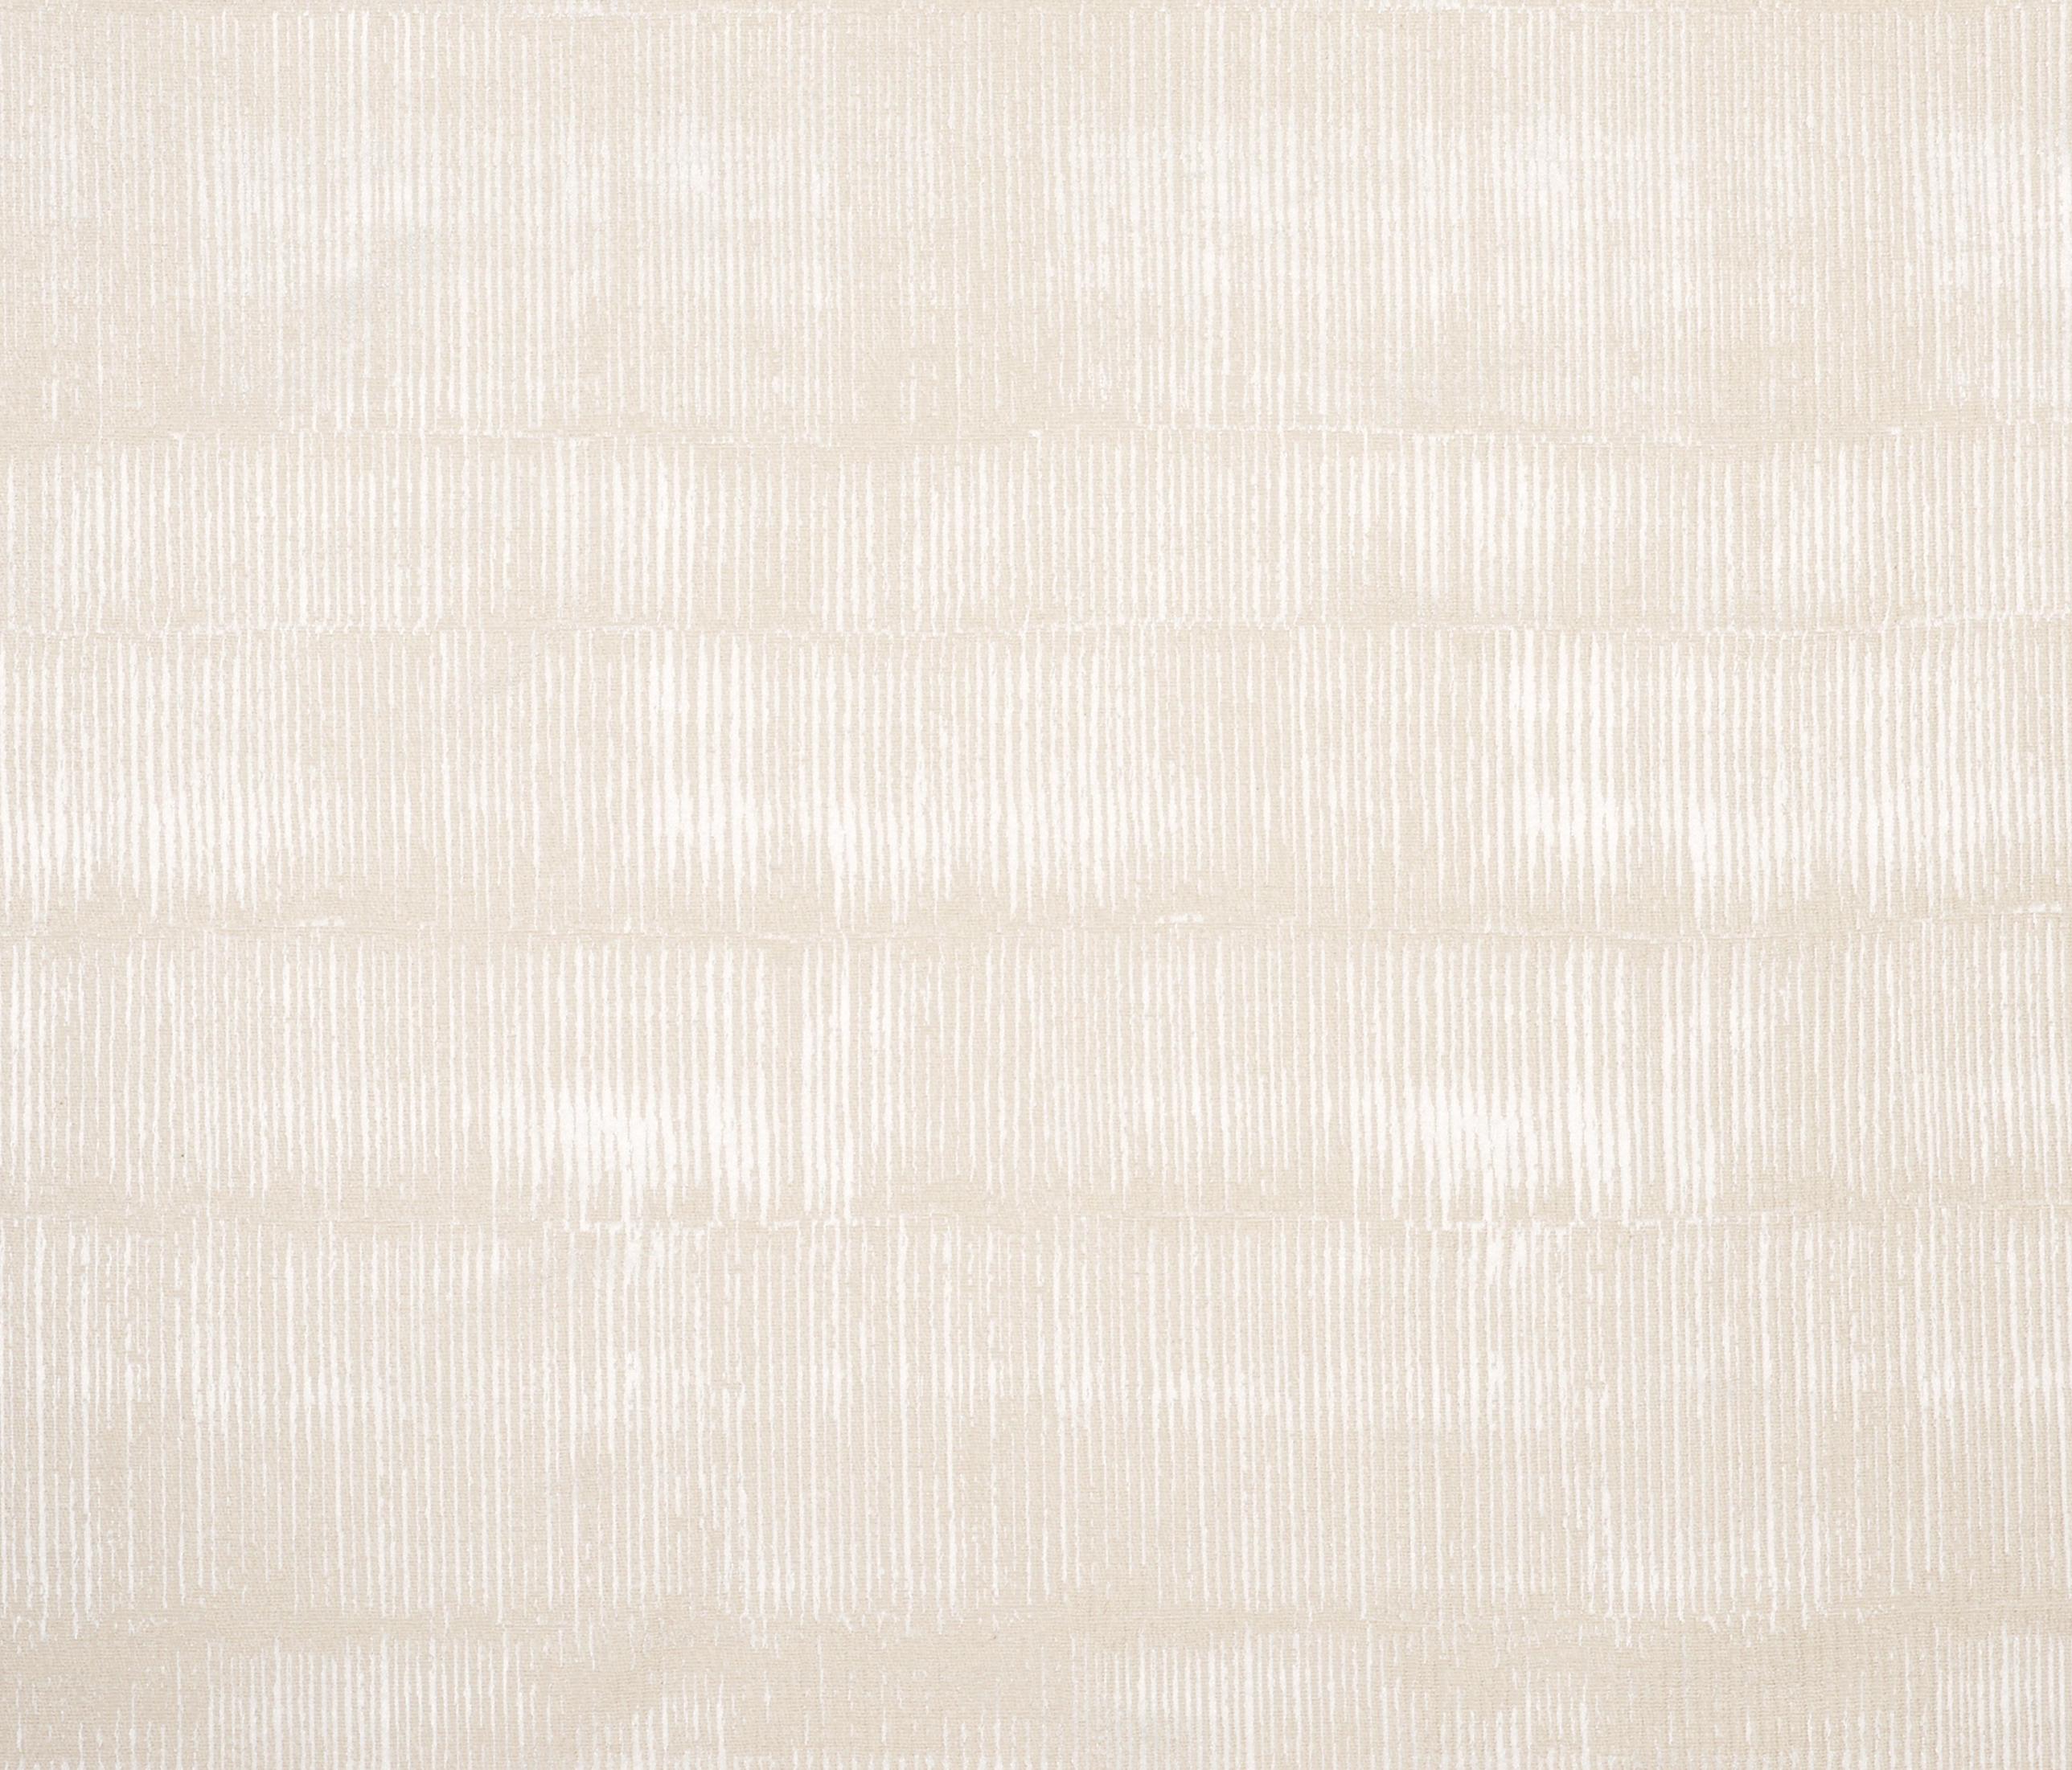 Assam 2683-01 by SAHCO | Upholstery fabrics